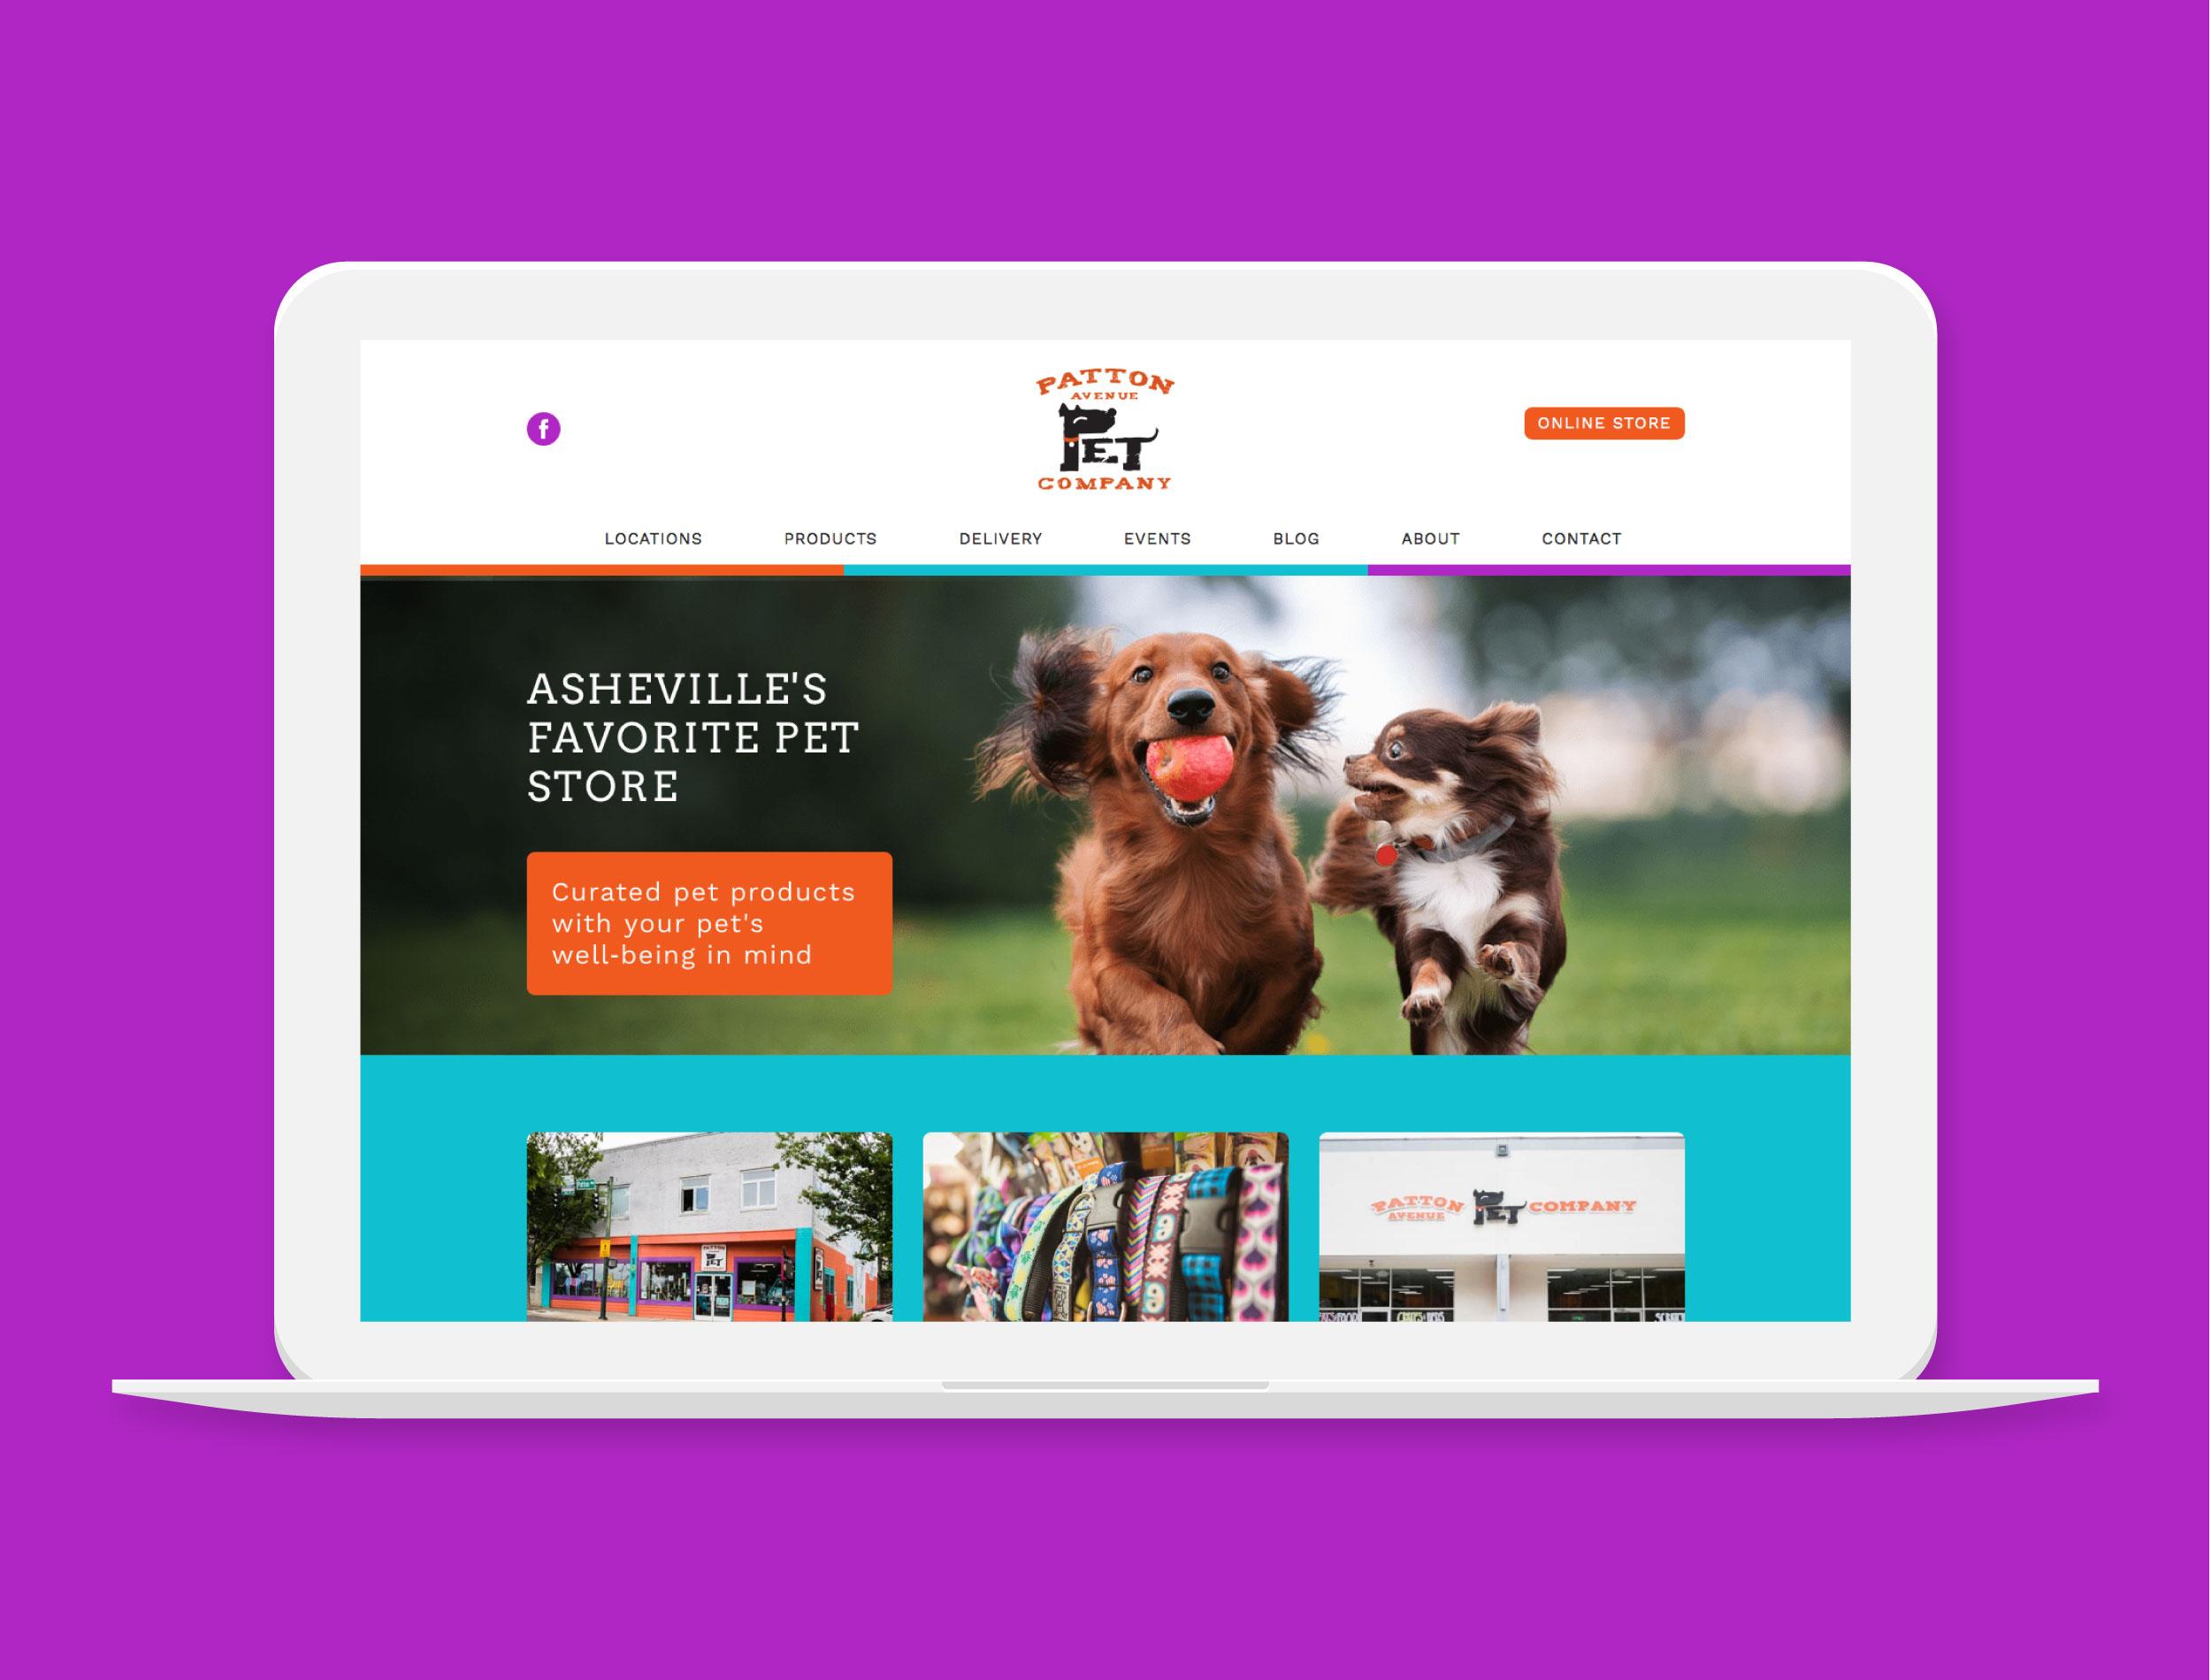 Patton Avenue Pet Company   Asheville Pet Supply Store   Project Details *built in Wordpress*   Visit Website